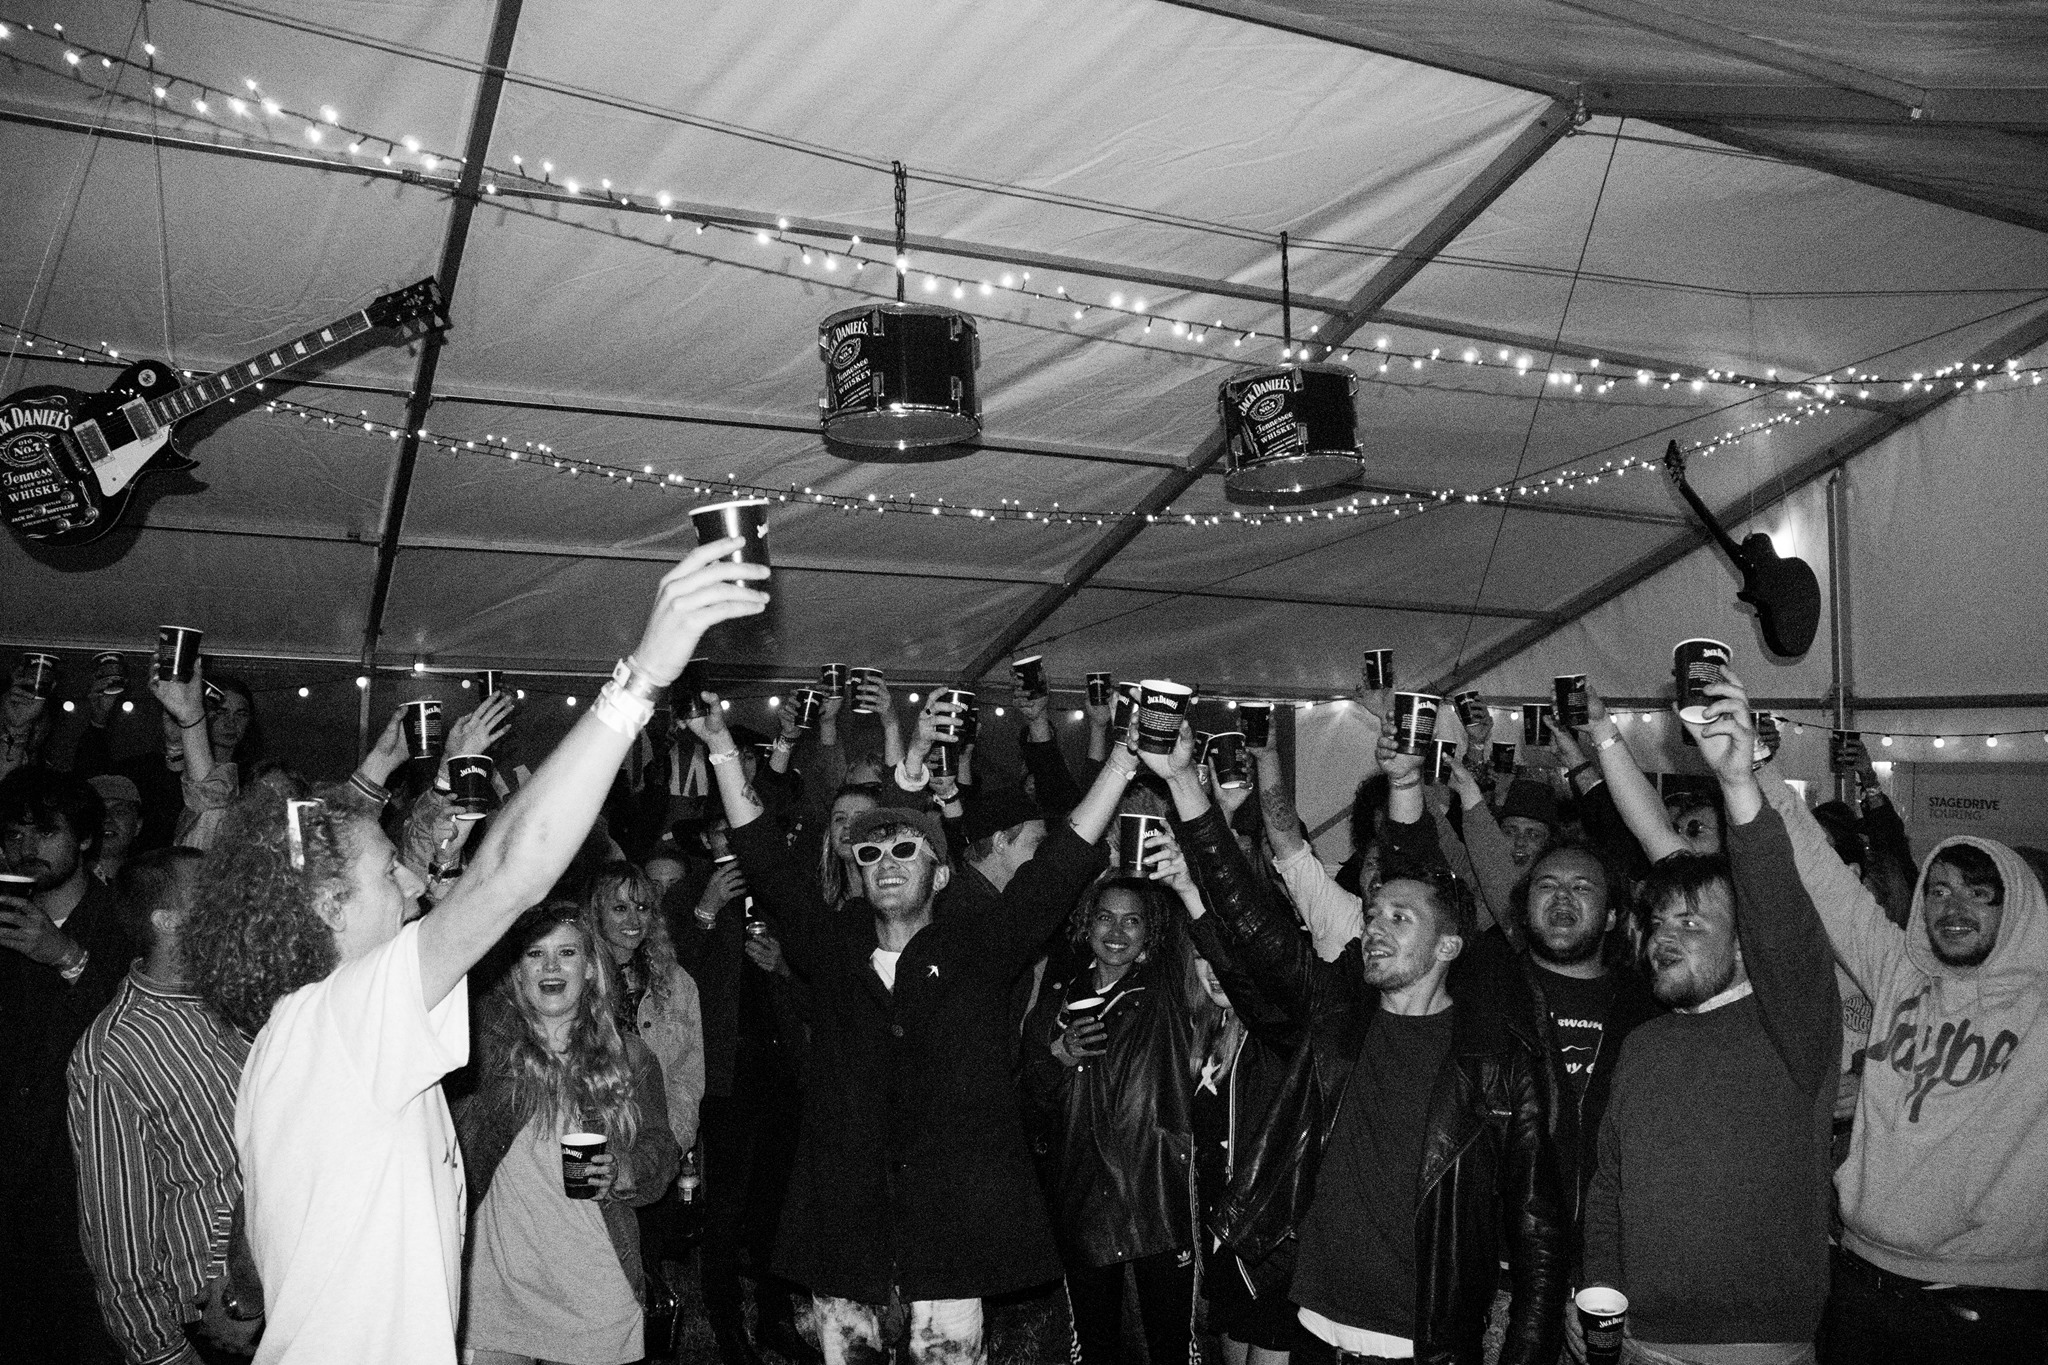 Backstage antics at Y Not Festival.